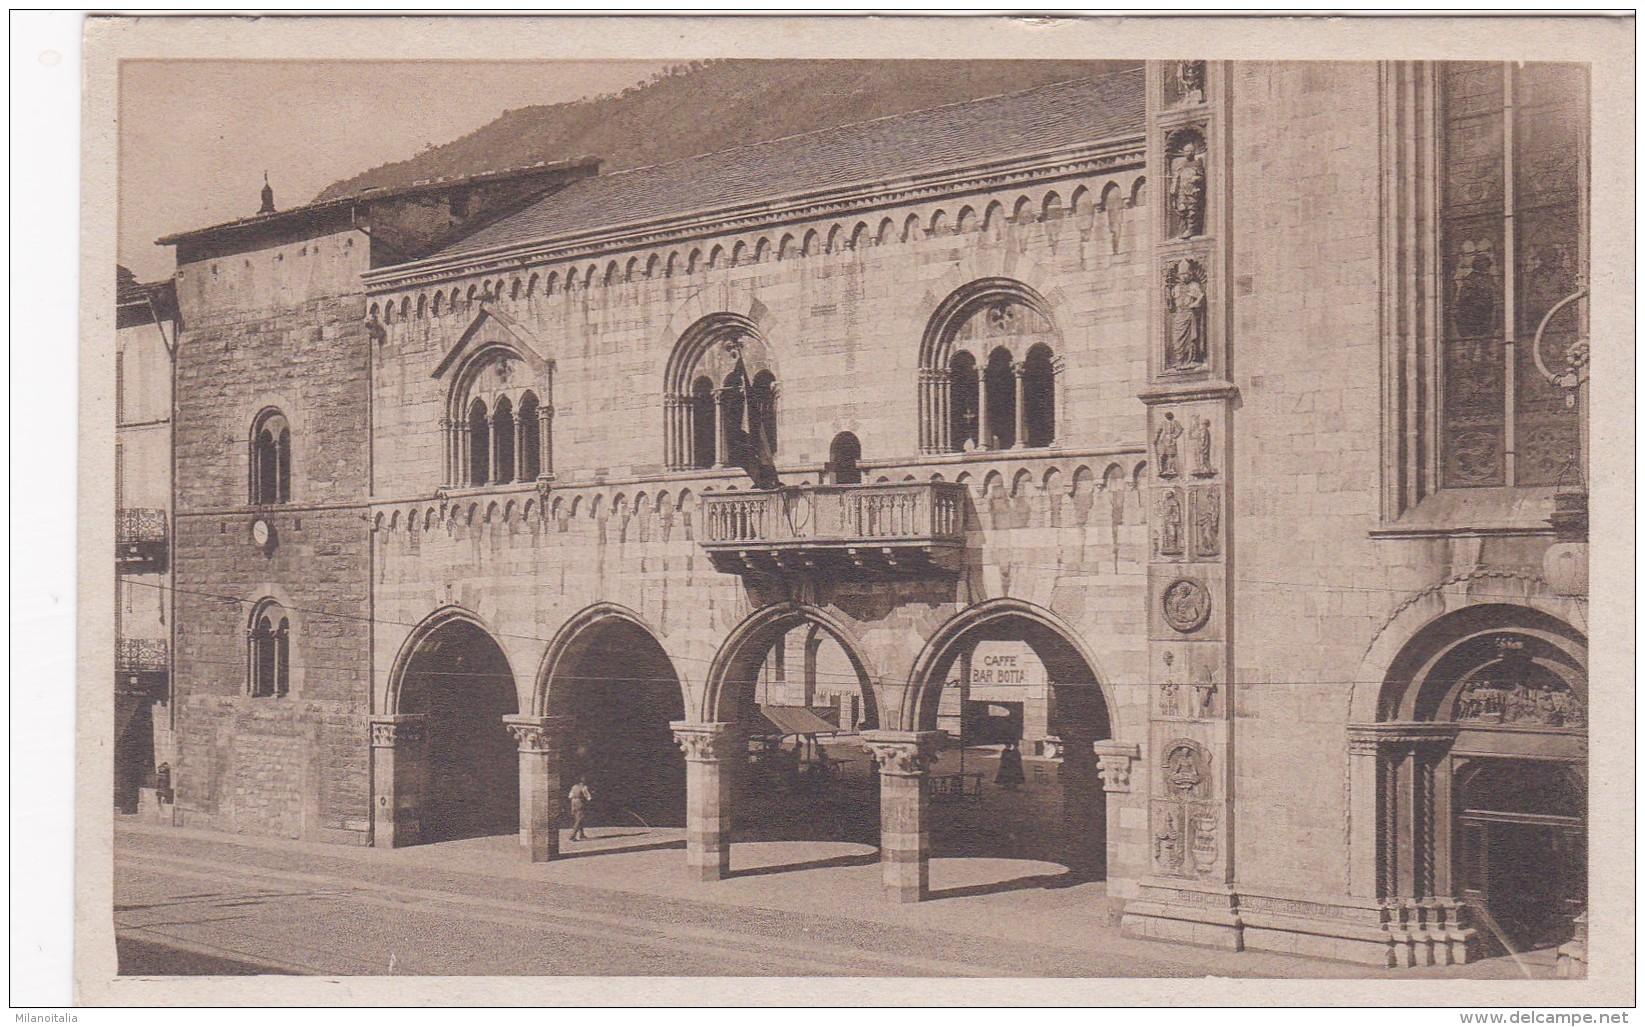 Como - Palazzo Broletto (6021) - Como